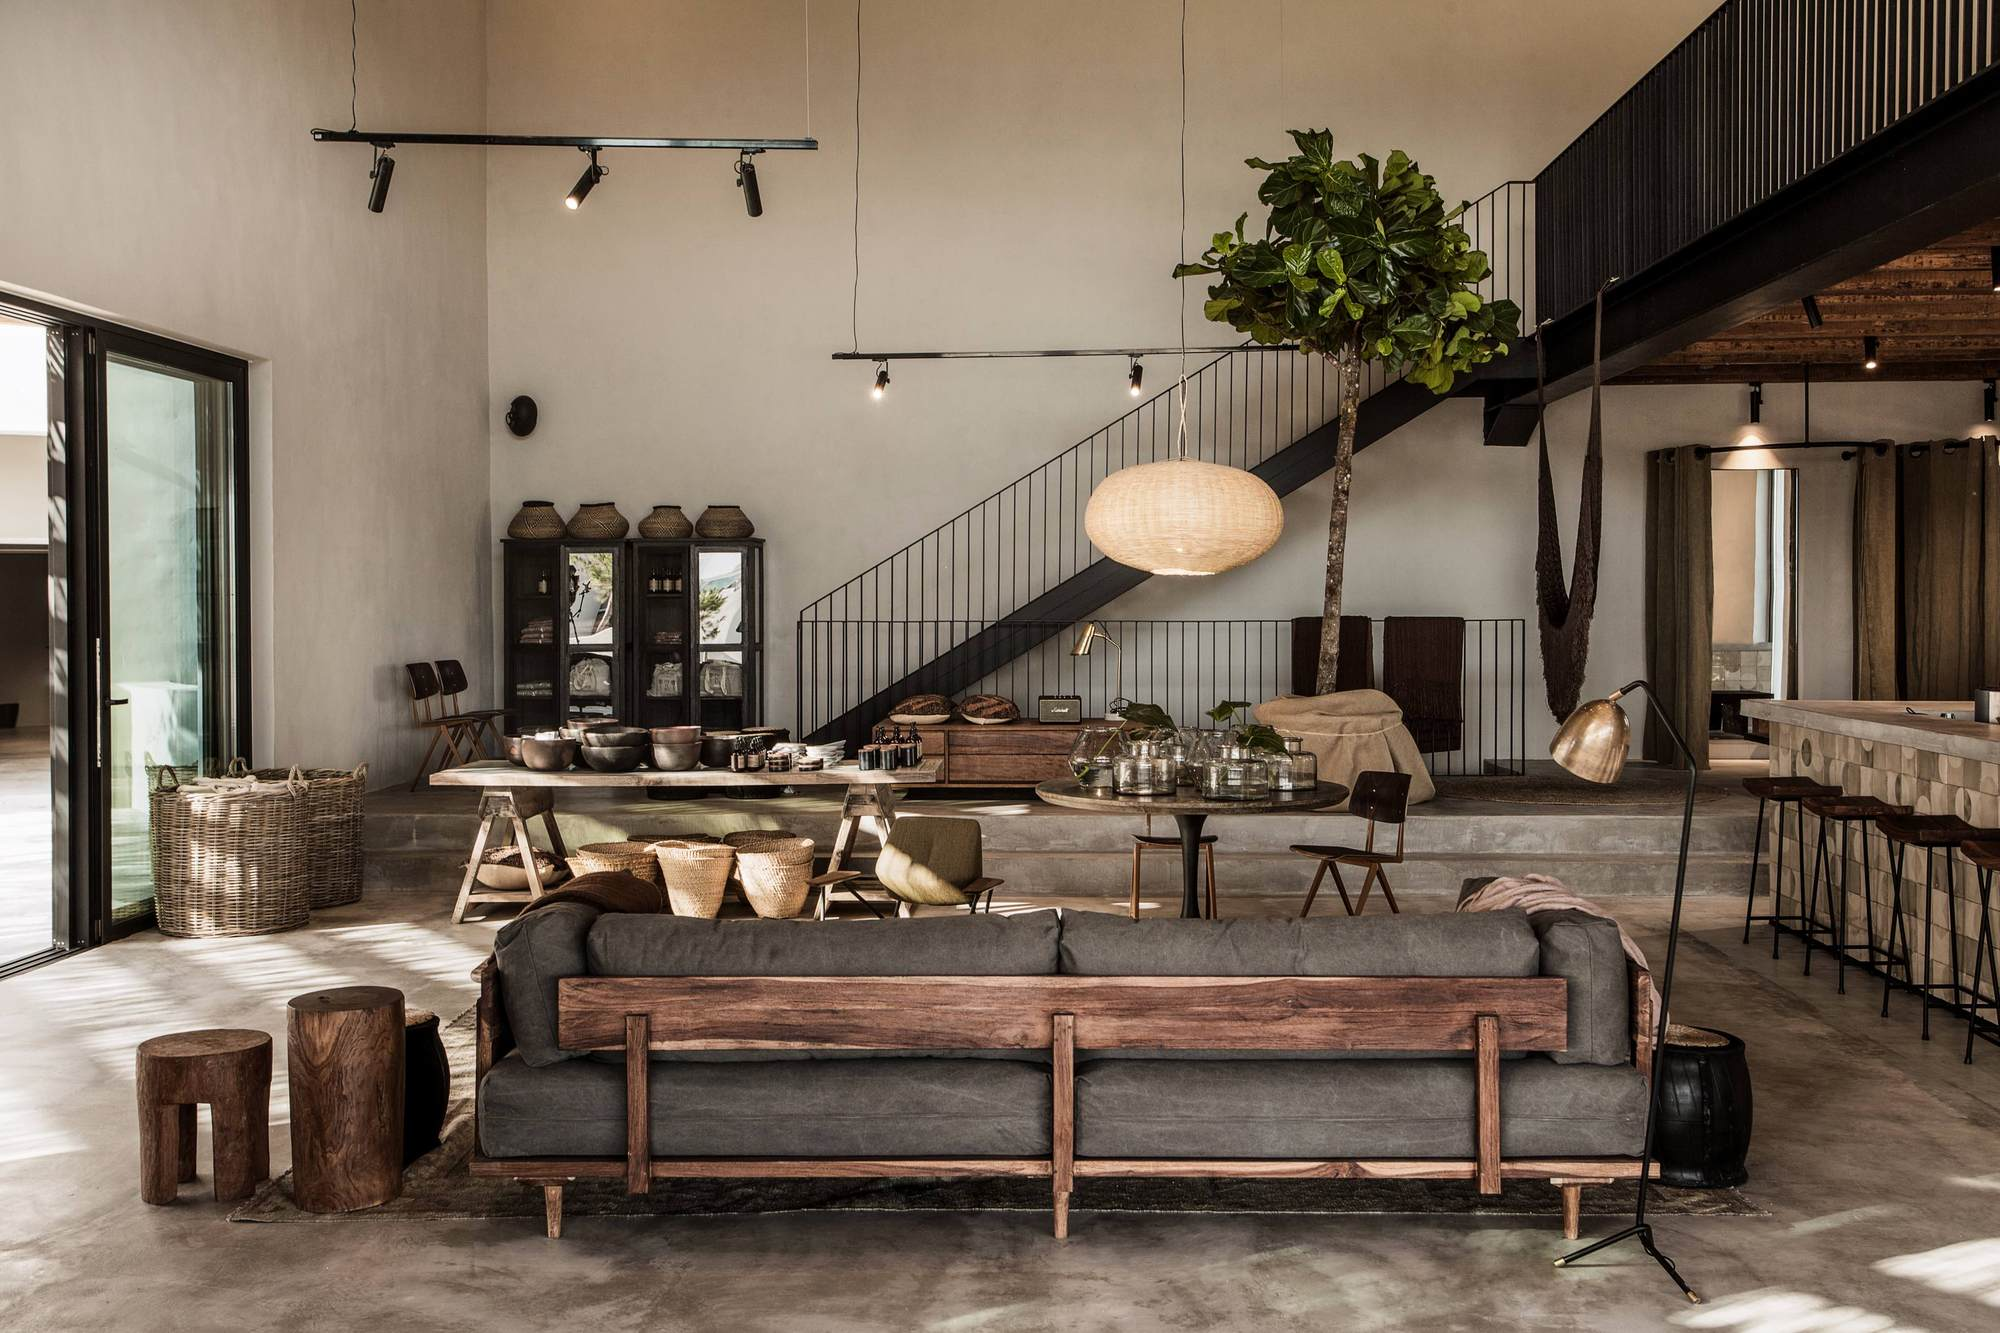 gallery of casa cook kos hotel mastrominas architecture 25. Black Bedroom Furniture Sets. Home Design Ideas